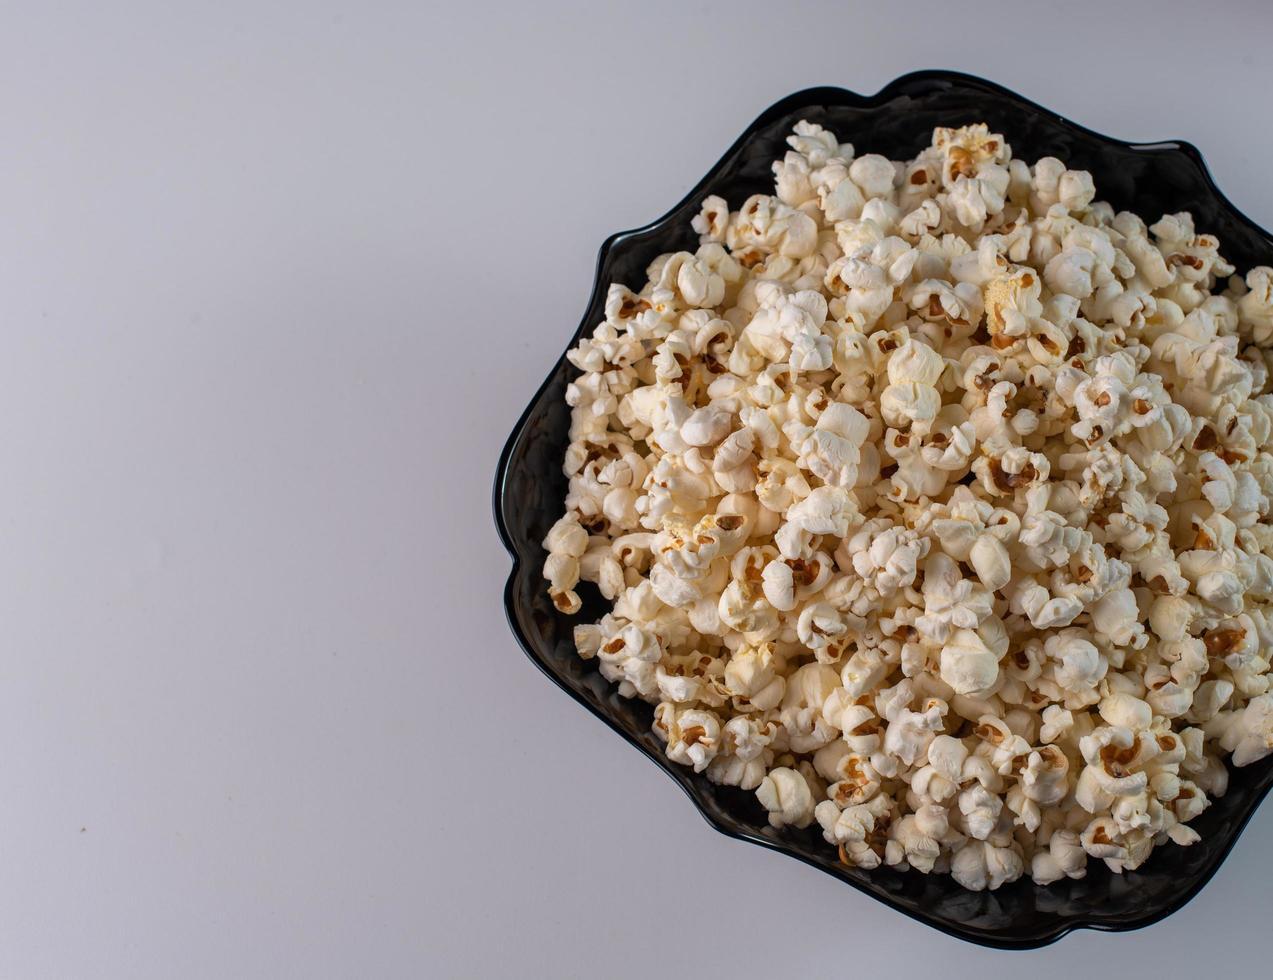 pop-corn sur fond blanc photo